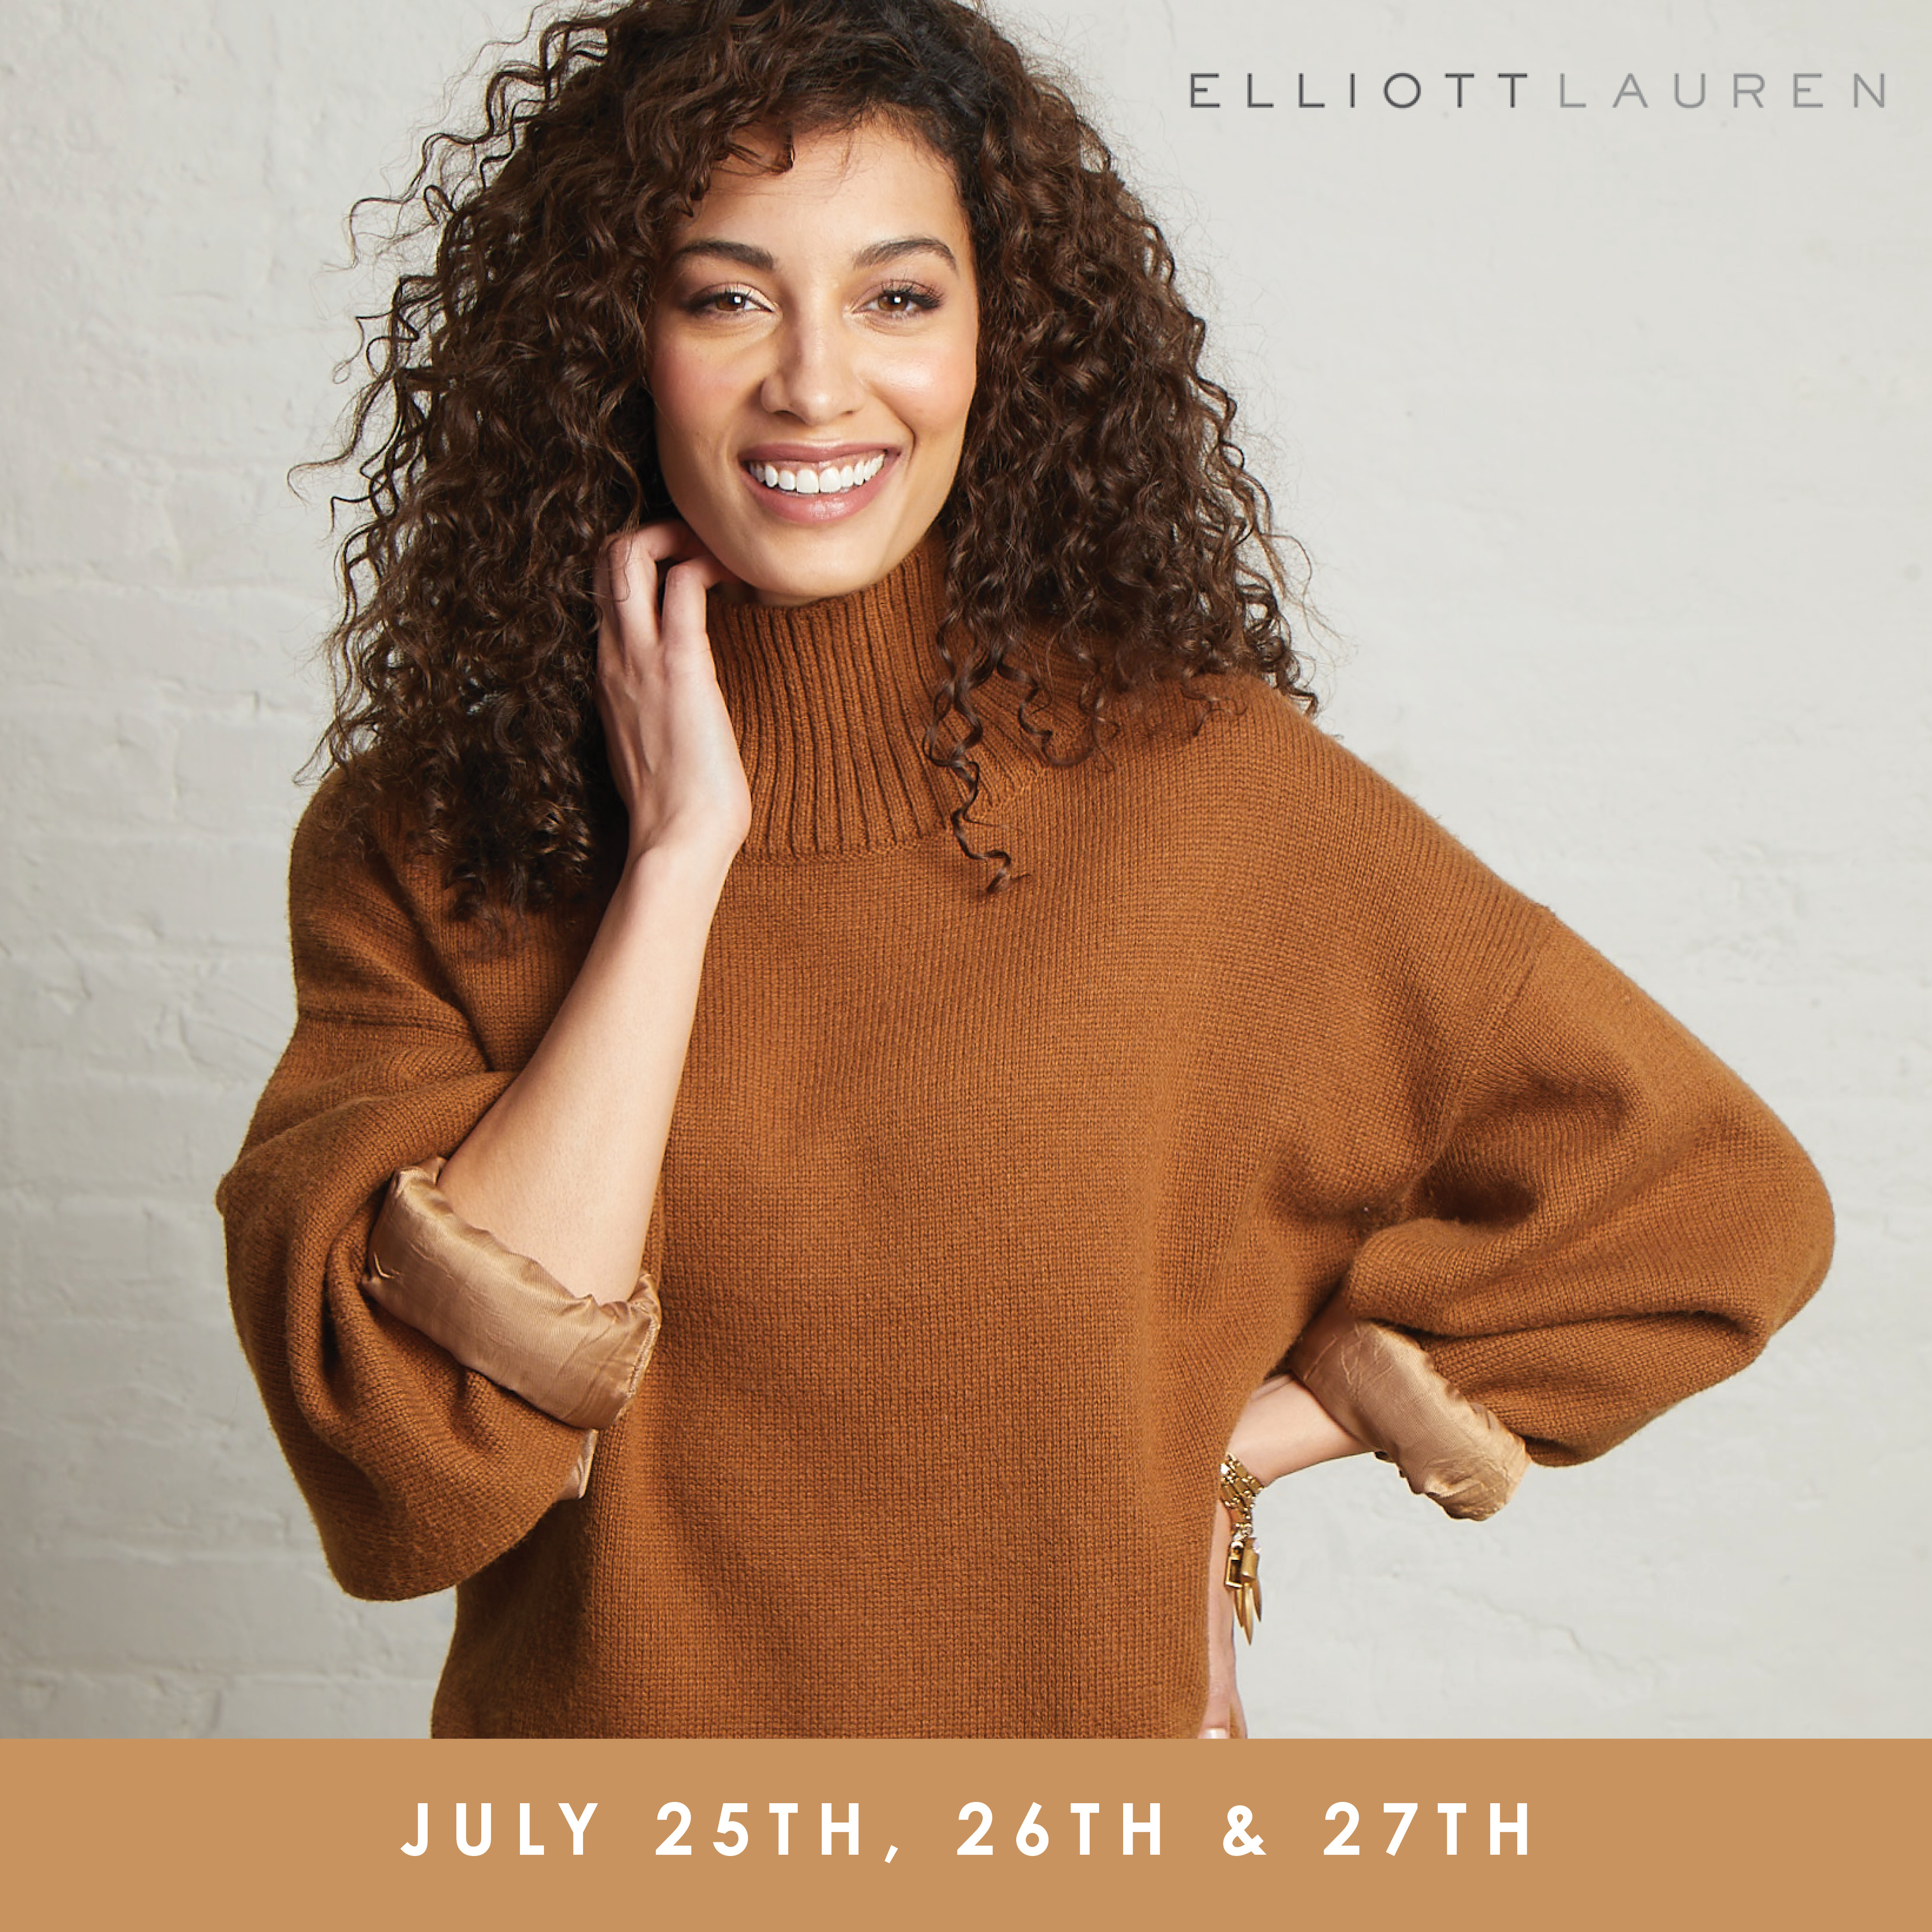 Elliott Lauren Fall Fashion Event